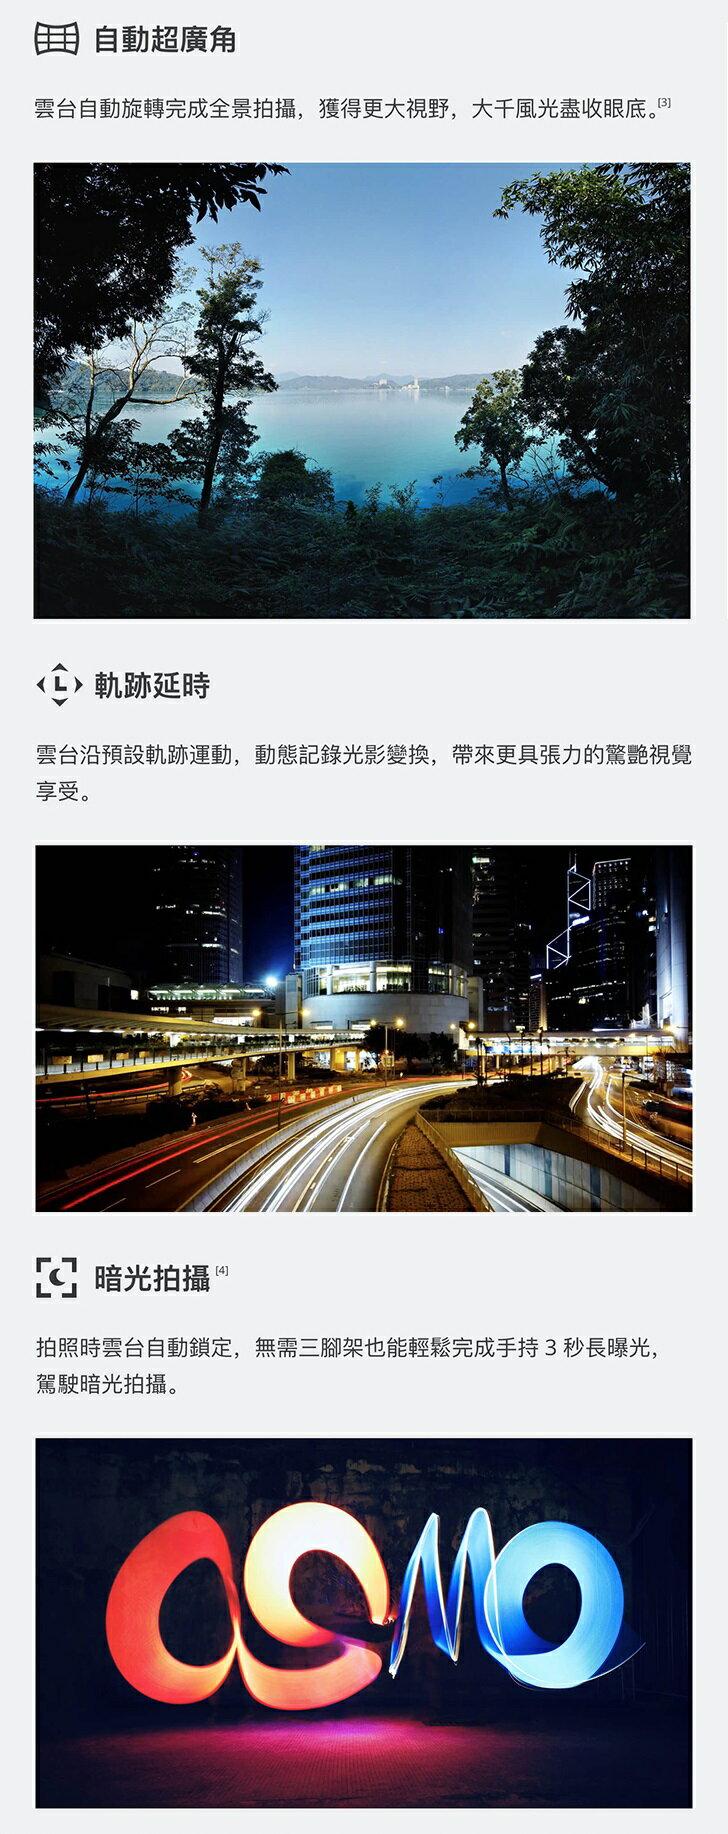 【APP領券最高折500】現貨 DJI Osmo Pocket 口袋雲台相機 全景 FPV 智能跟隨 三軸口袋機 公司貨 7